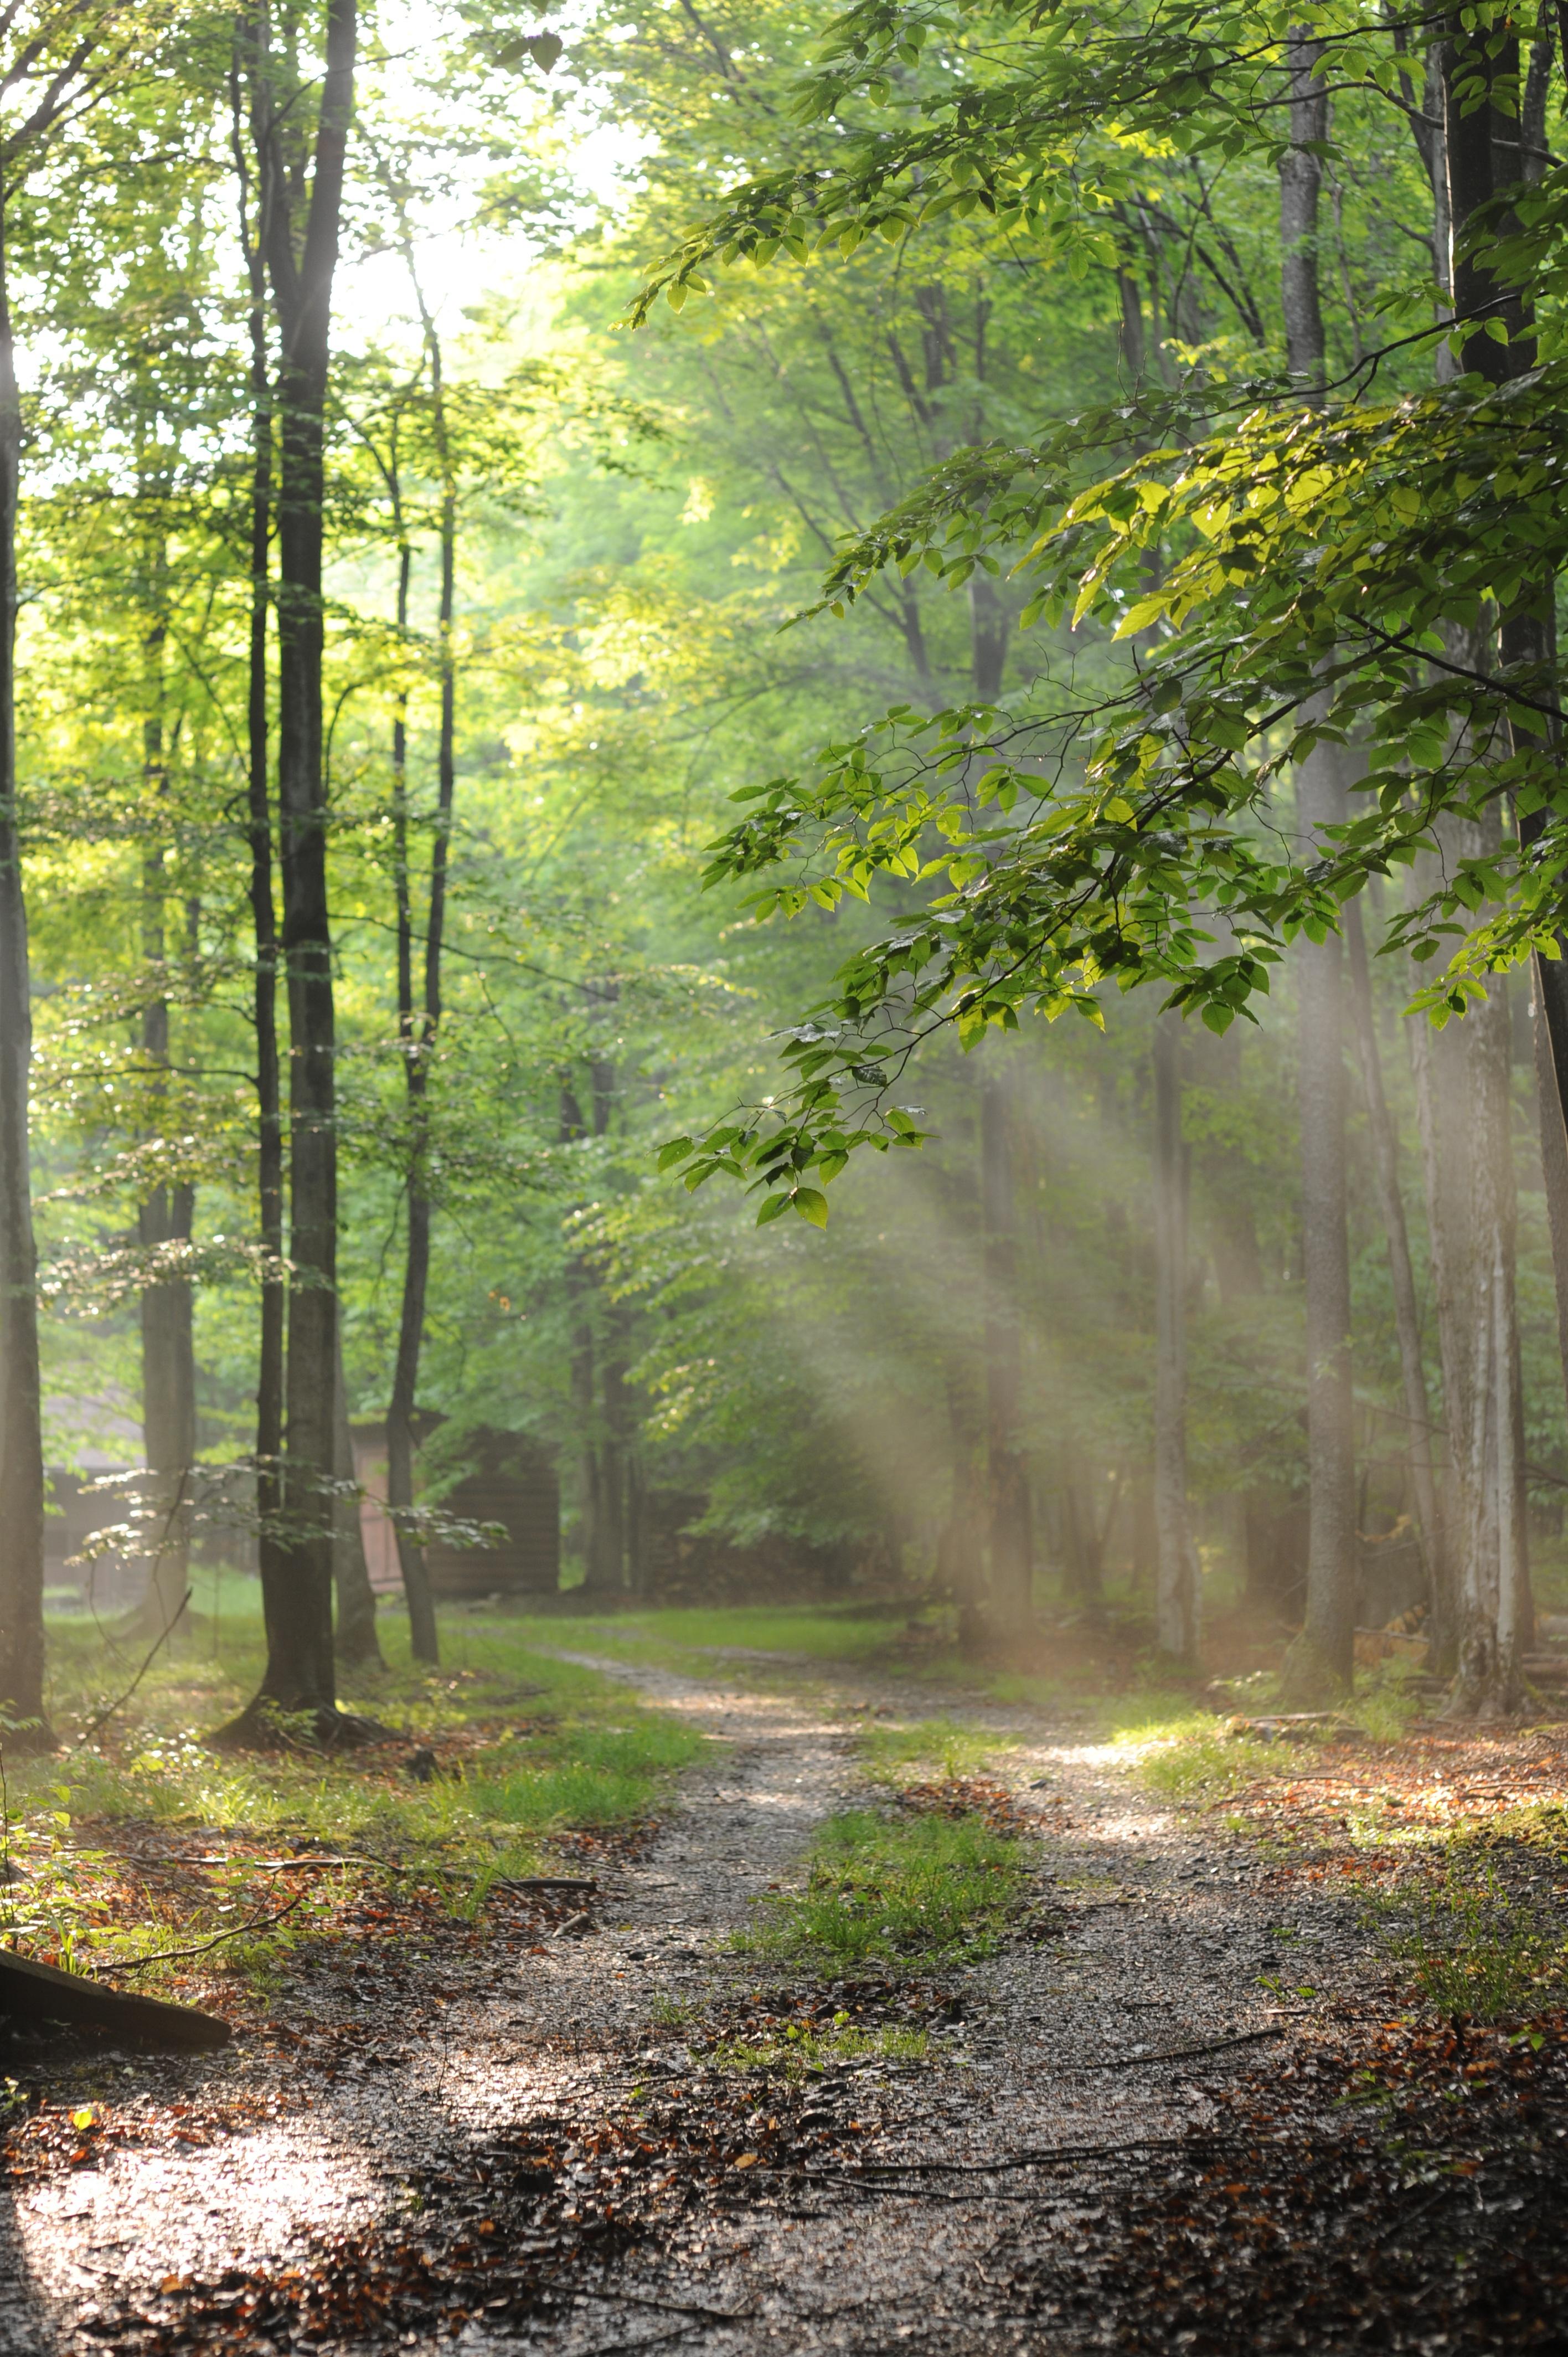 Fotos gratis rbol naturaleza bosque camino desierto for Arboles para plantar en verano